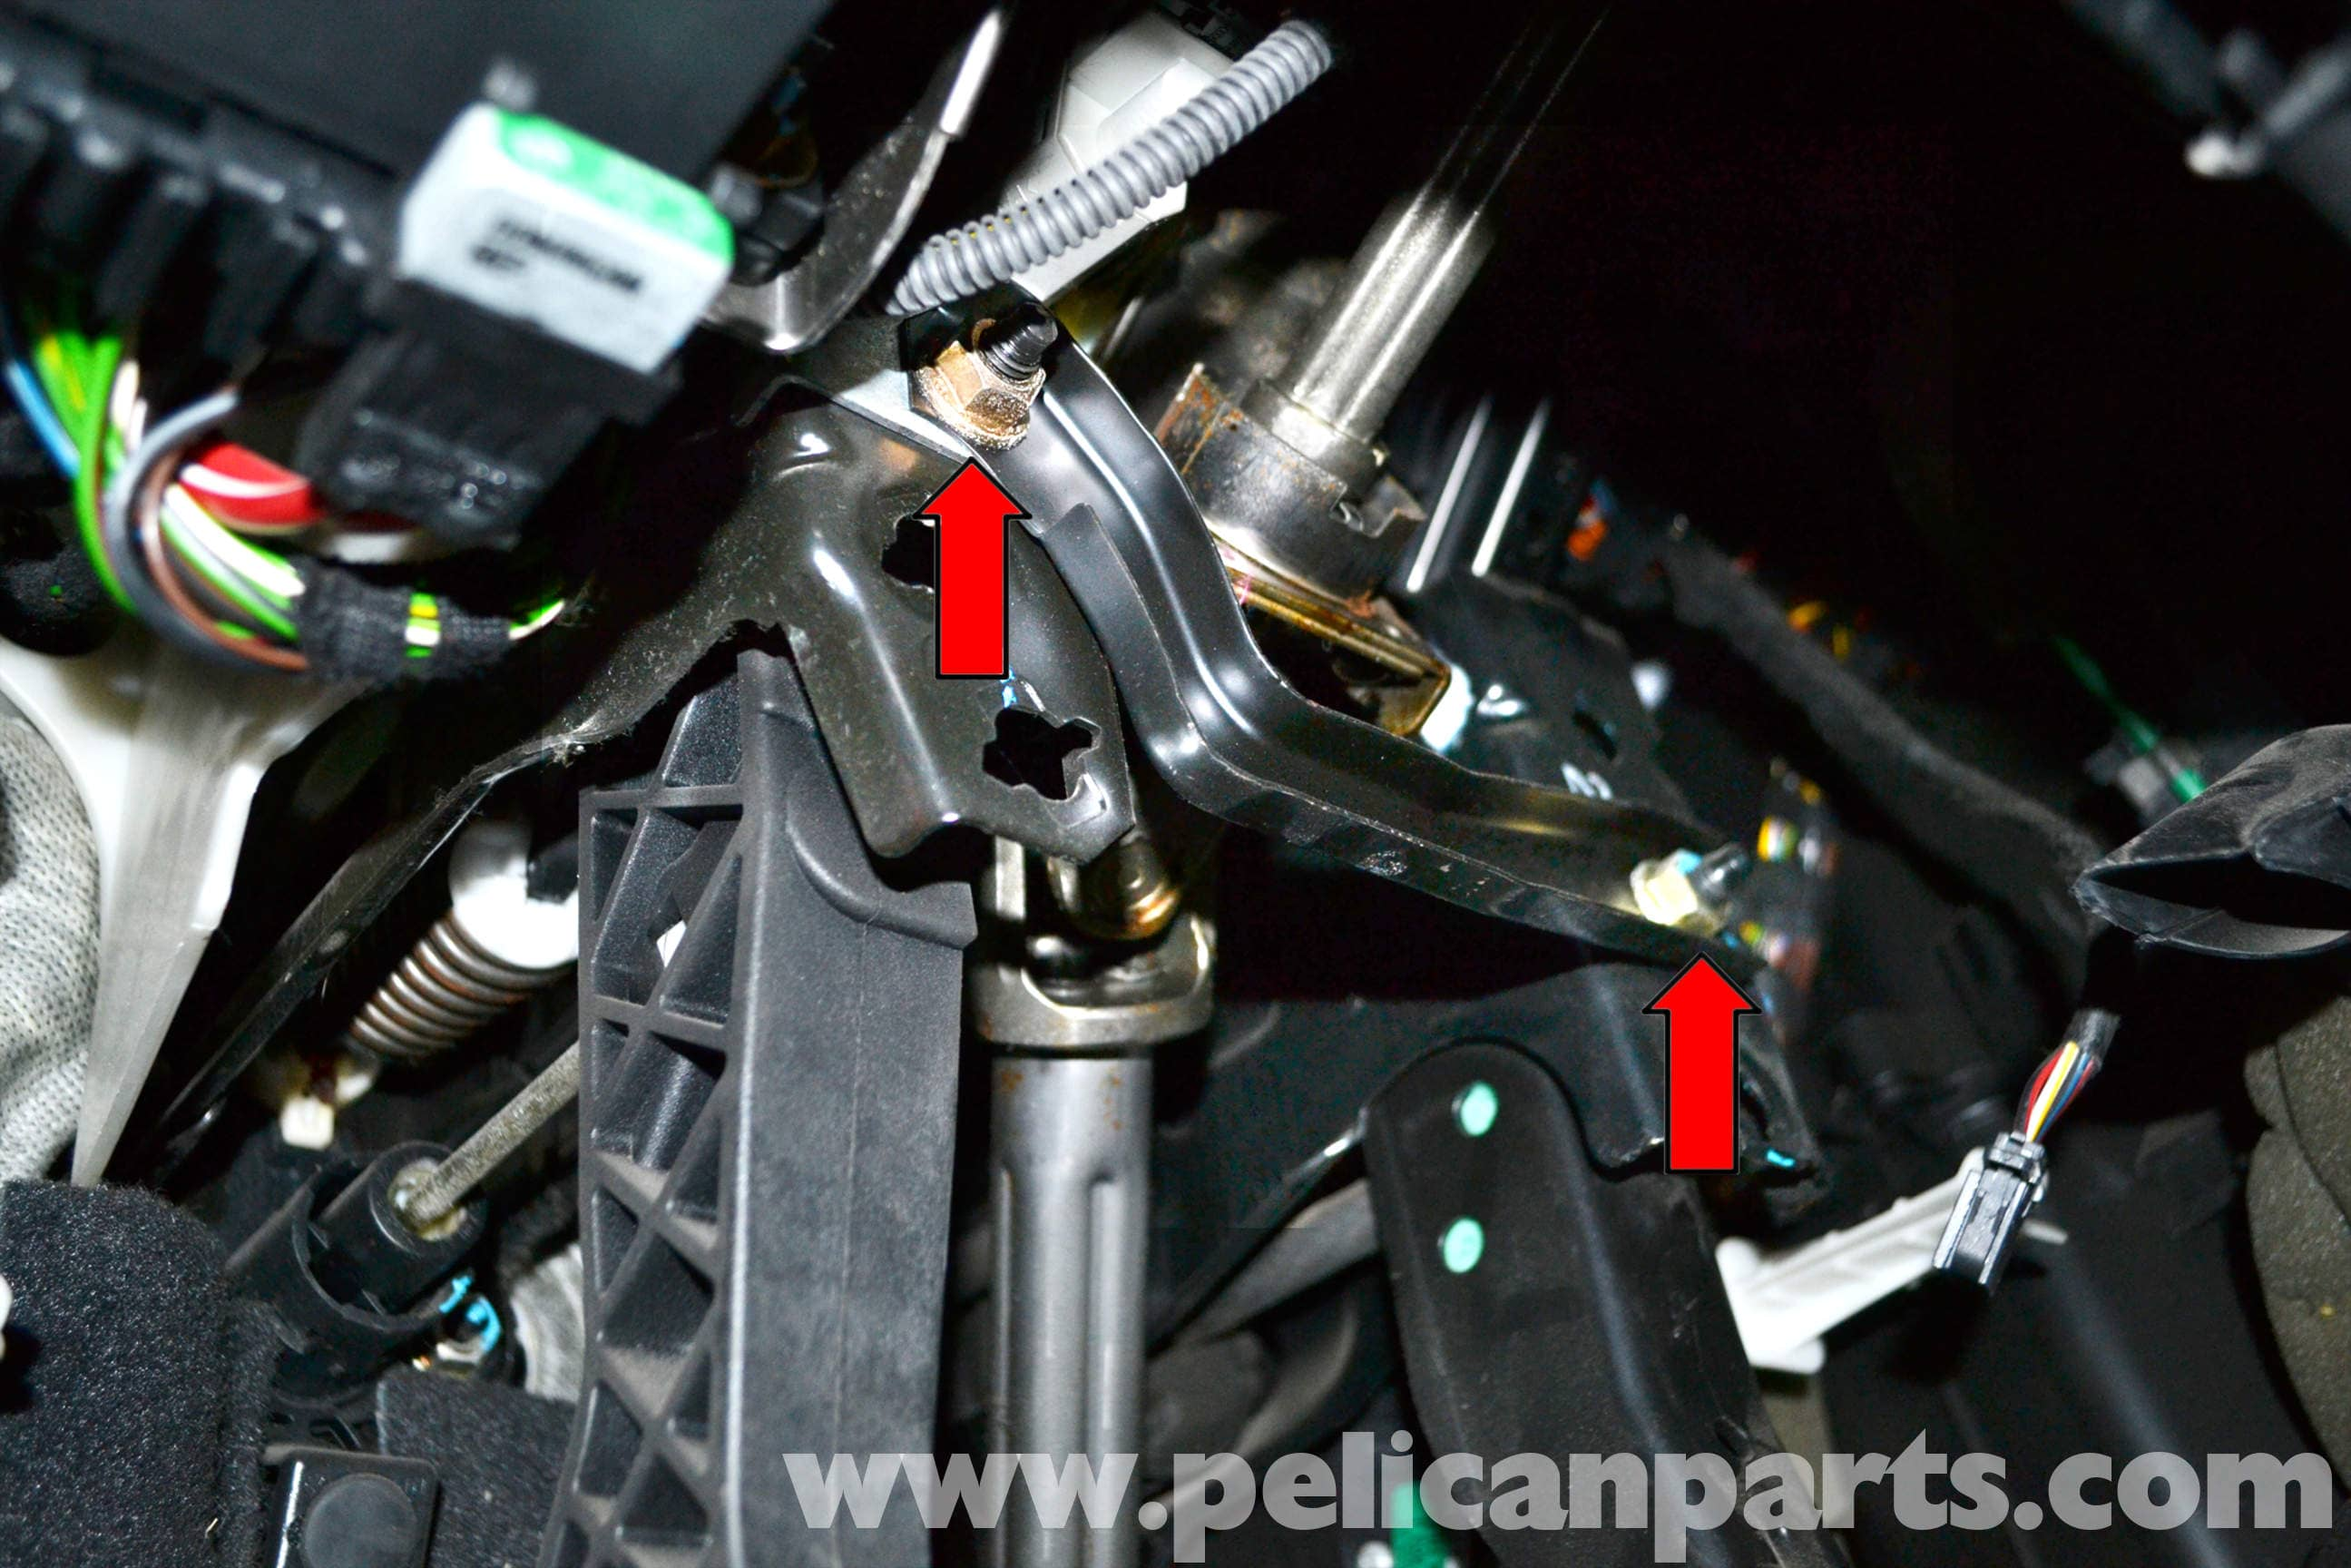 2011 Mustang Headlight Wiring Diagram Volkswagen Golf Gti Mk V Brake Booster Replacement 2006